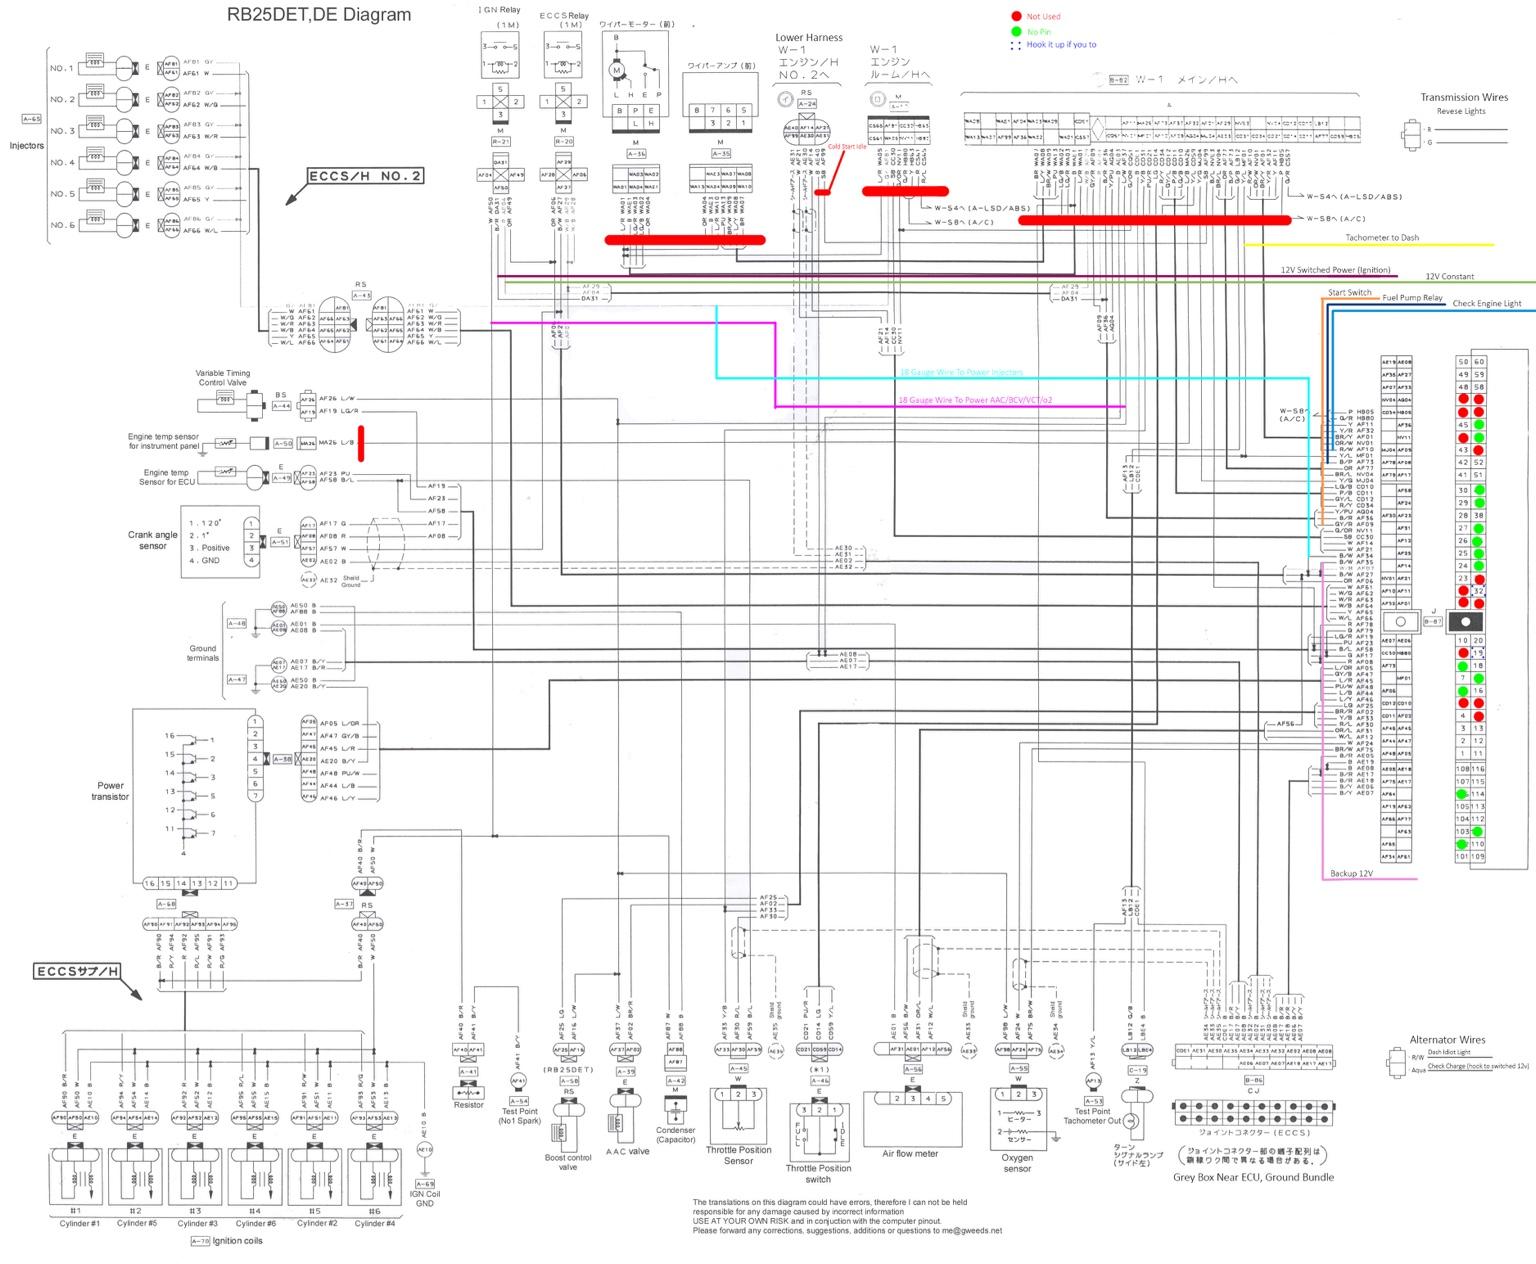 c279bbf8b910537c4fcd50a23efe2c46?resize\\\\\\\\\\\\\\\=665%2C547 s15 wiring diagram s15 wiring diagrams Basic Electrical Wiring Diagrams at suagrazia.org